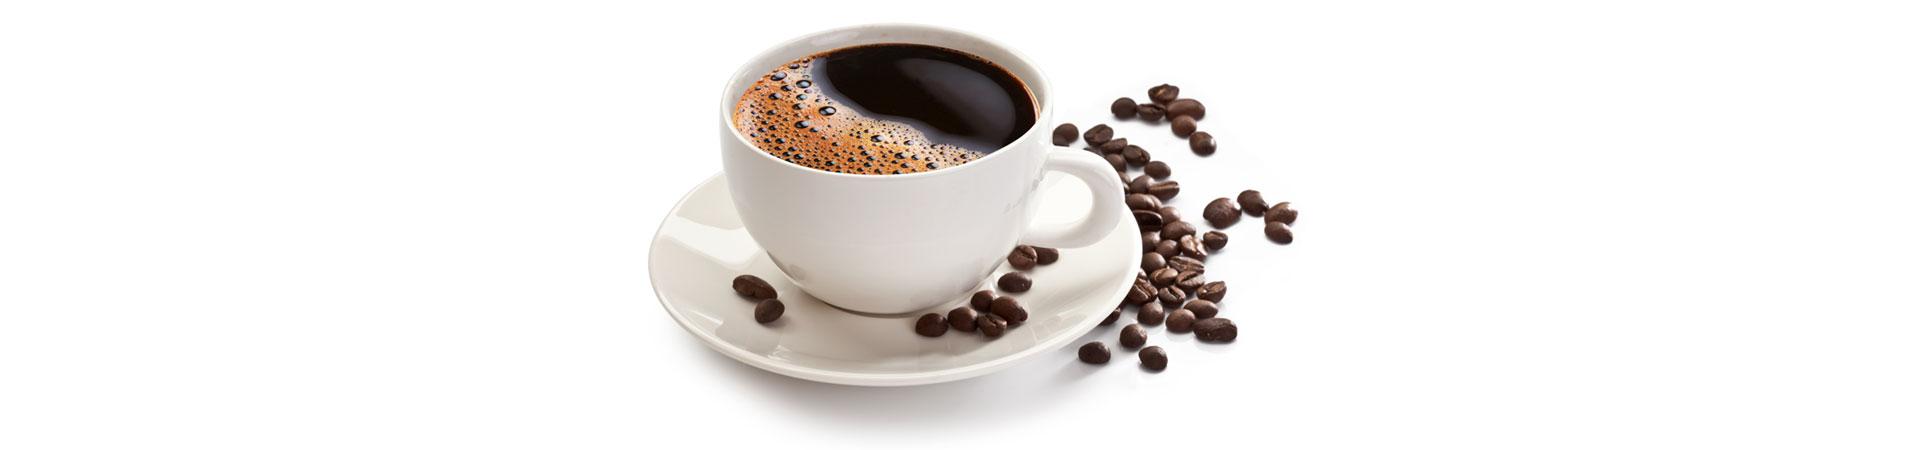 Can Coffee Harm Your Teeth?